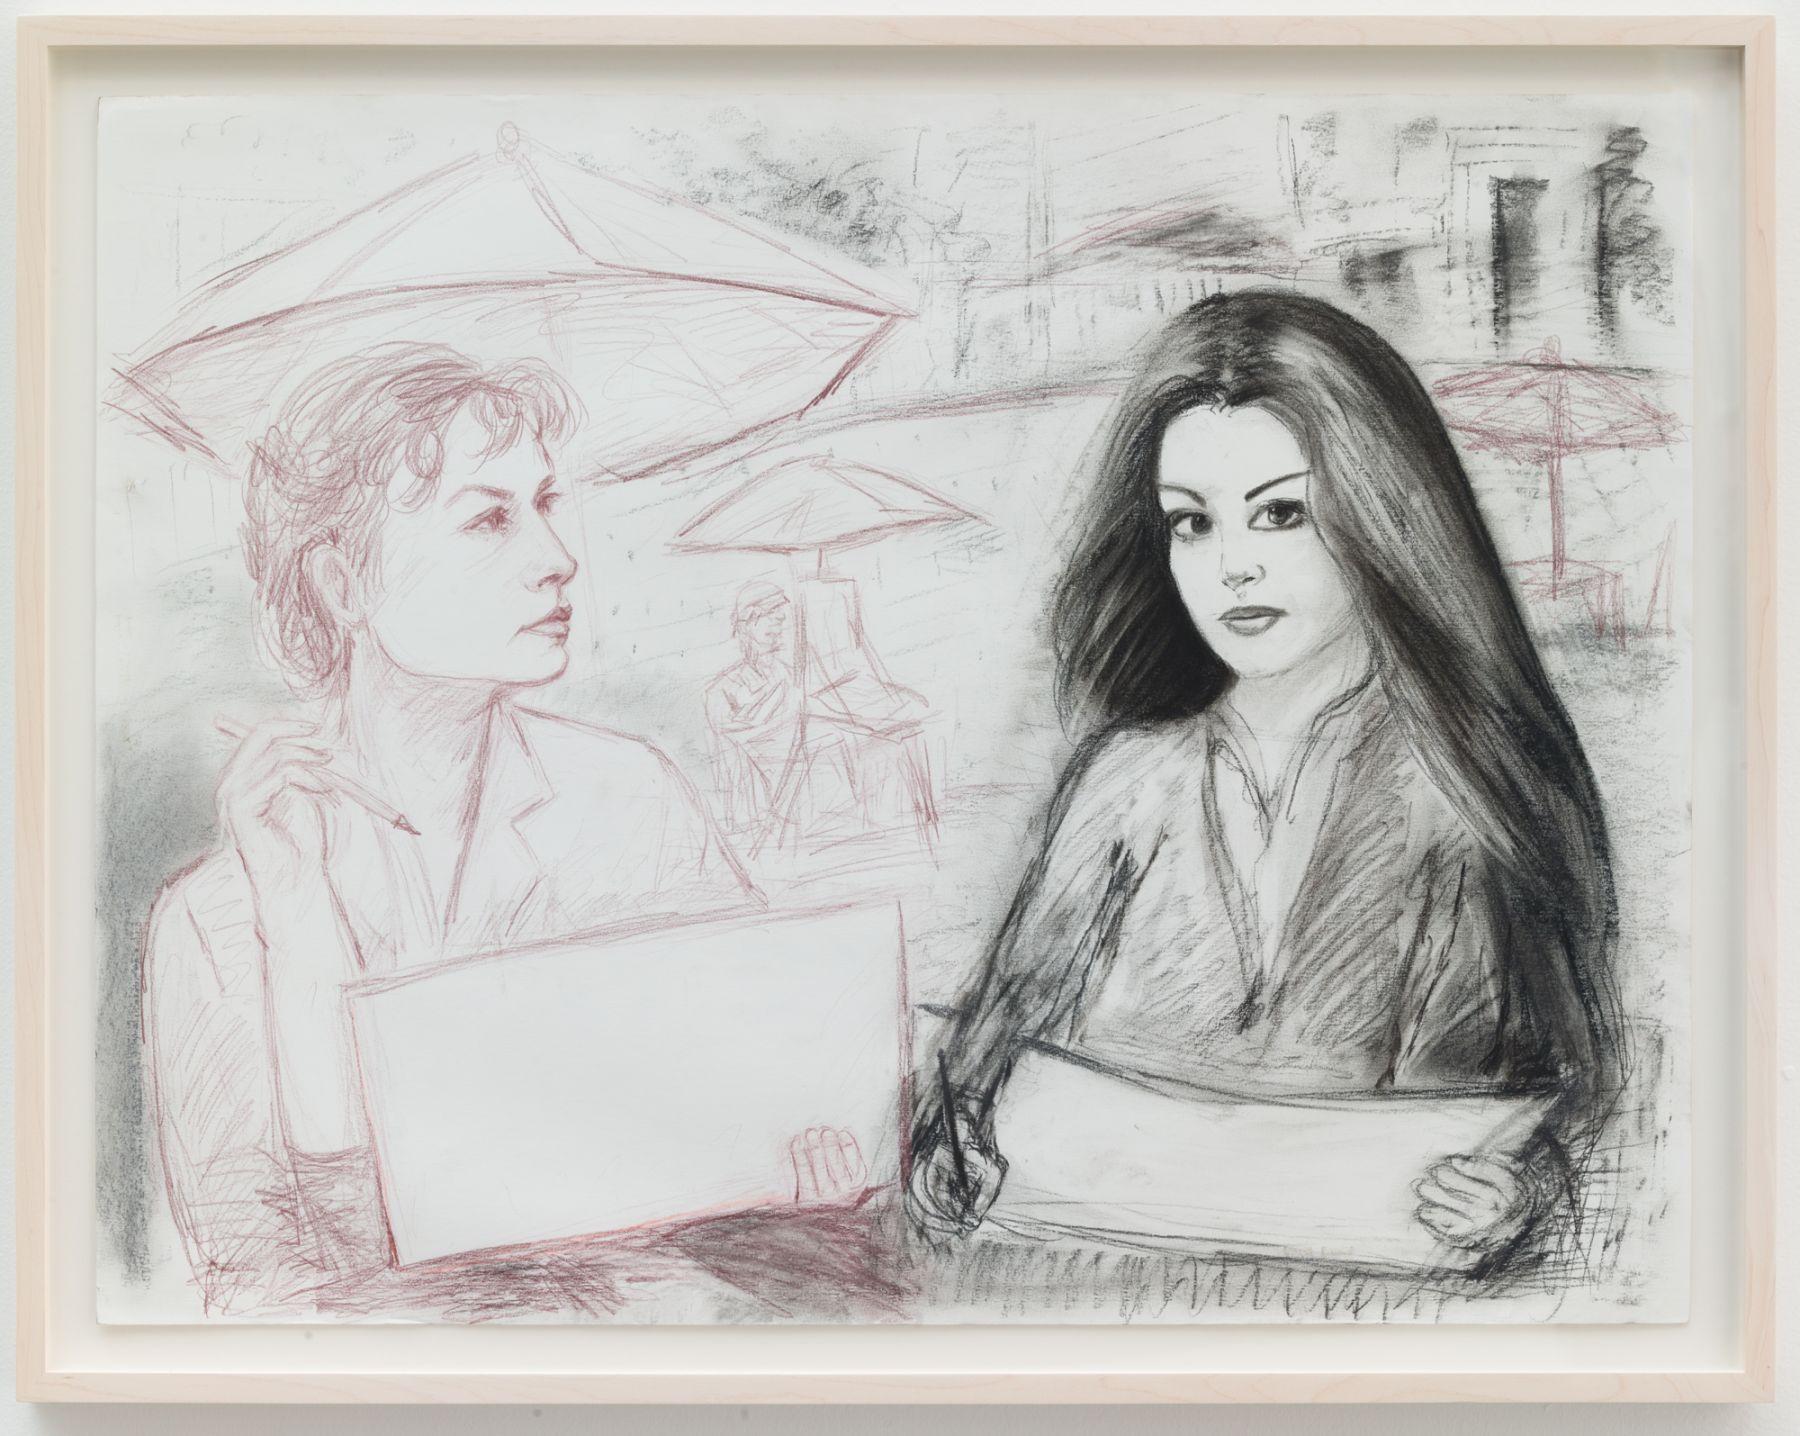 Christian Jankowski, Isabelle Huppert - Nastassja Kinski